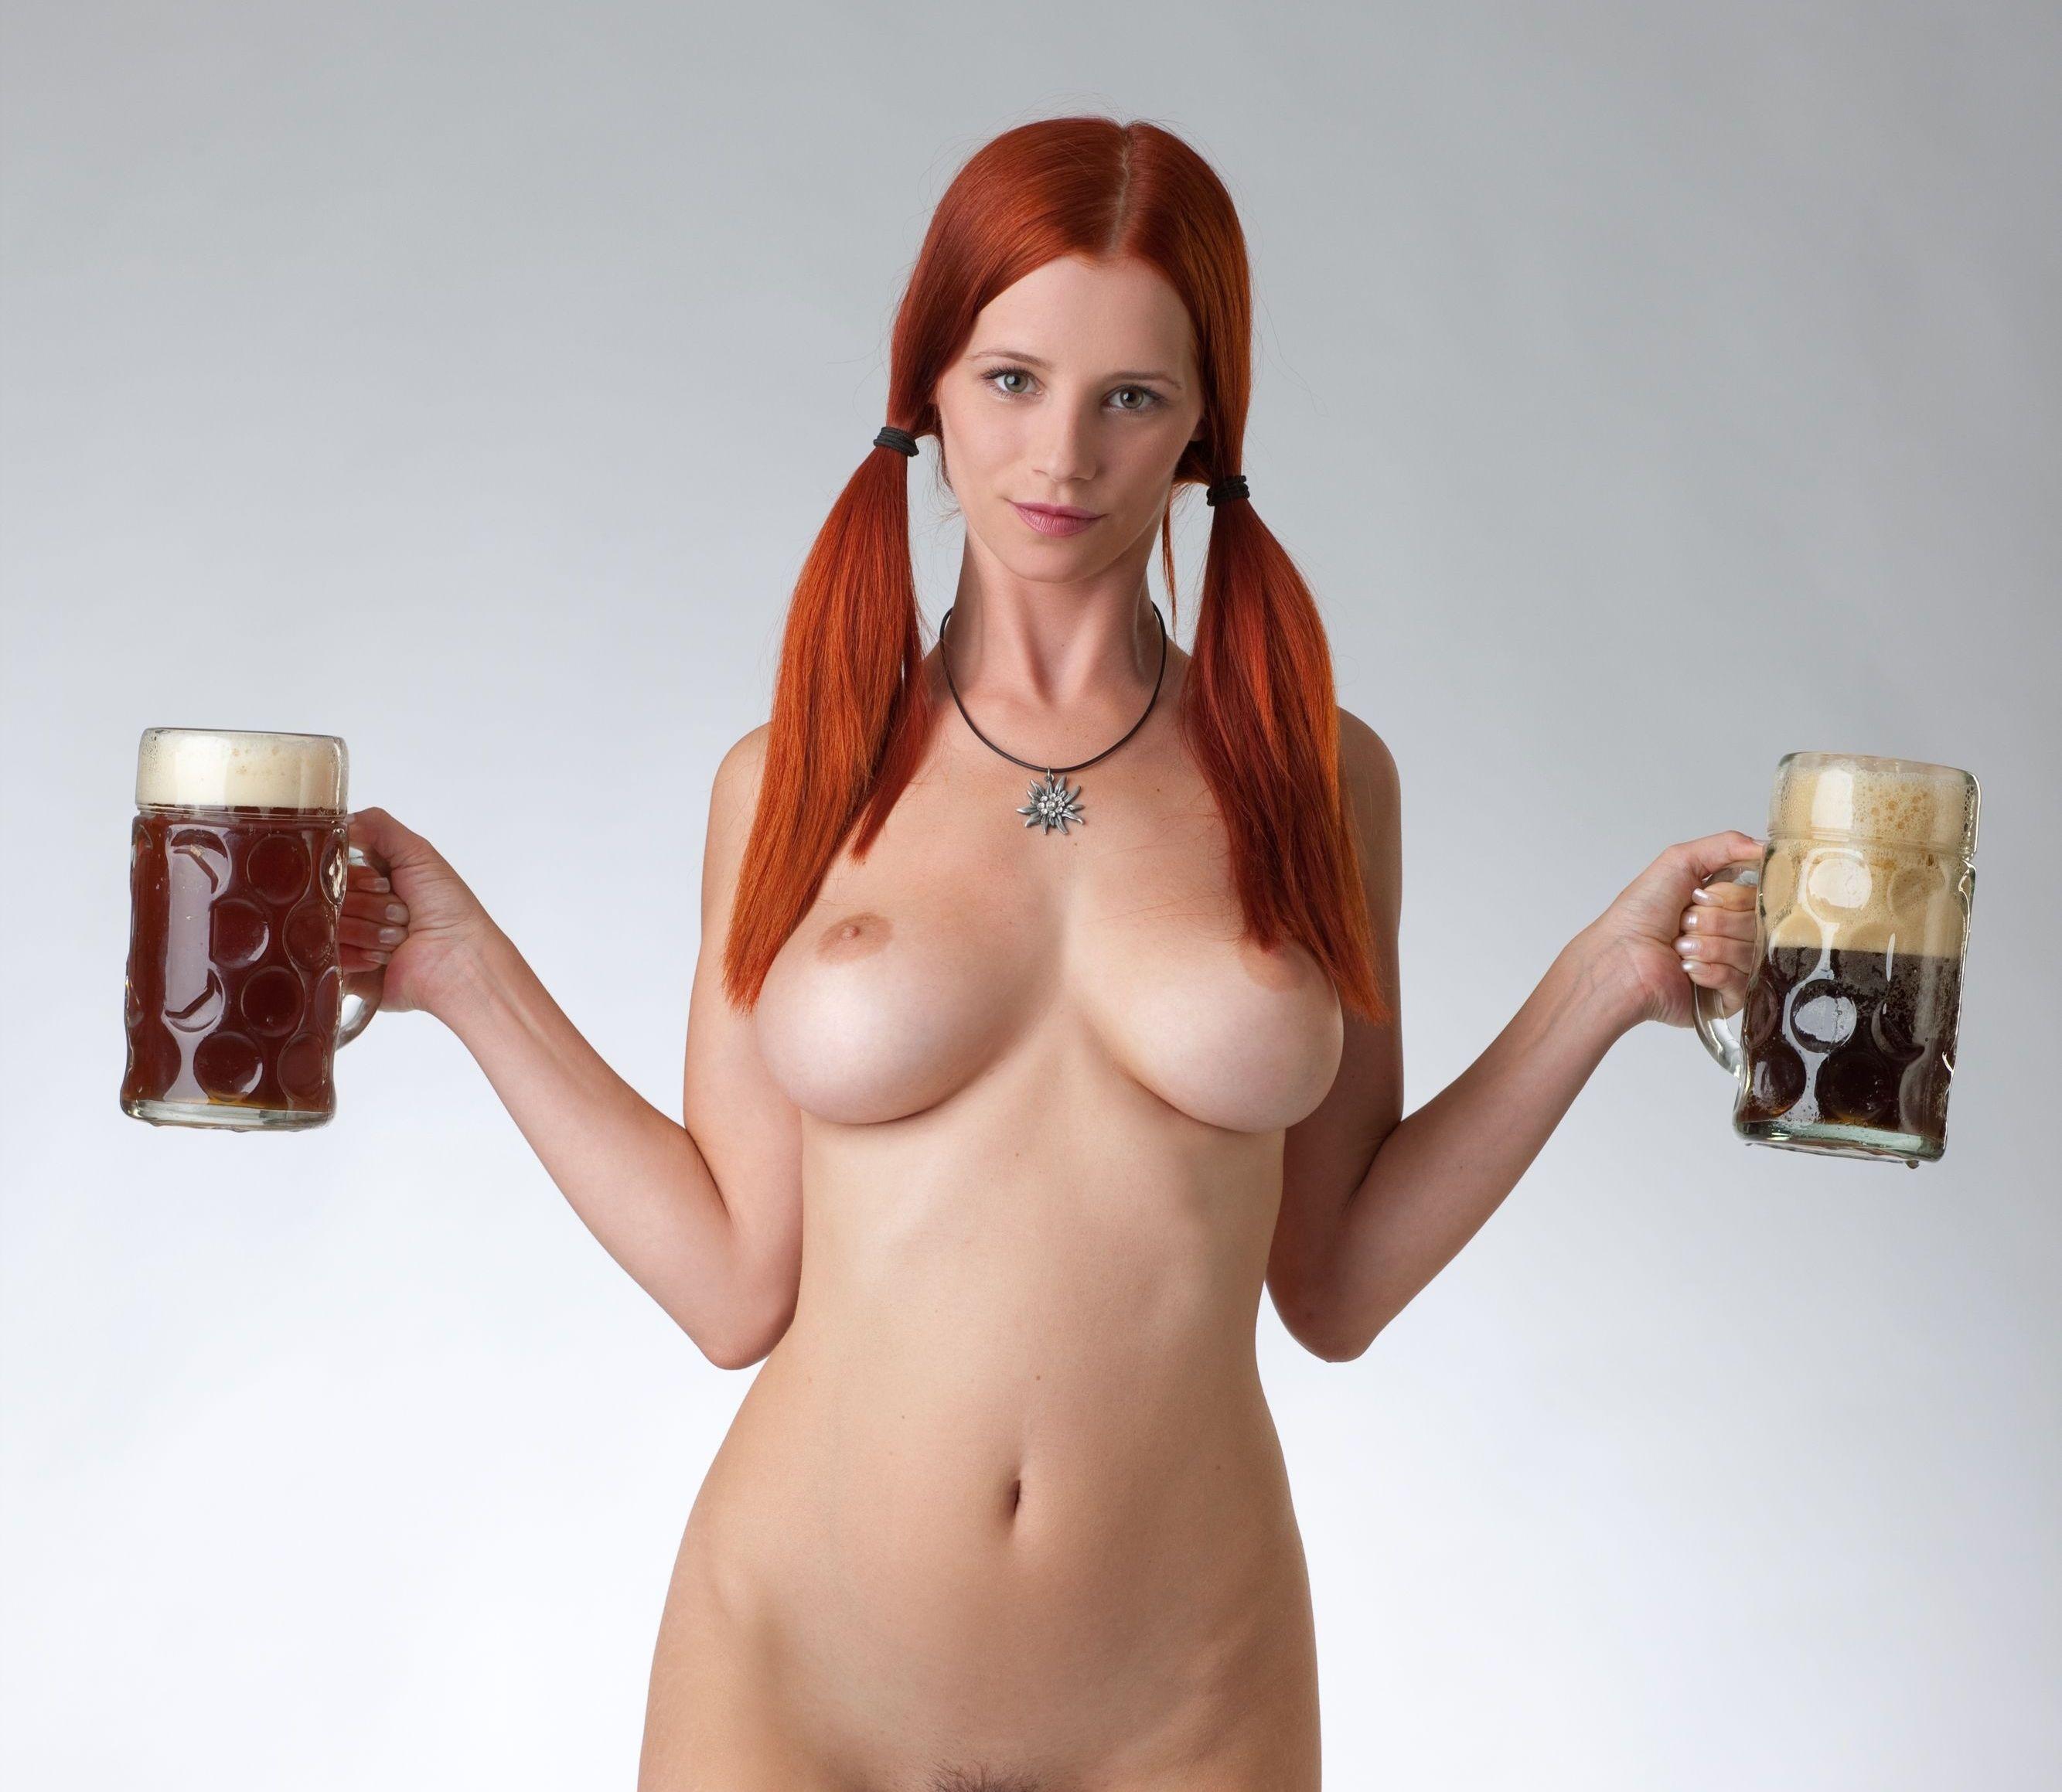 Эротика и пиво